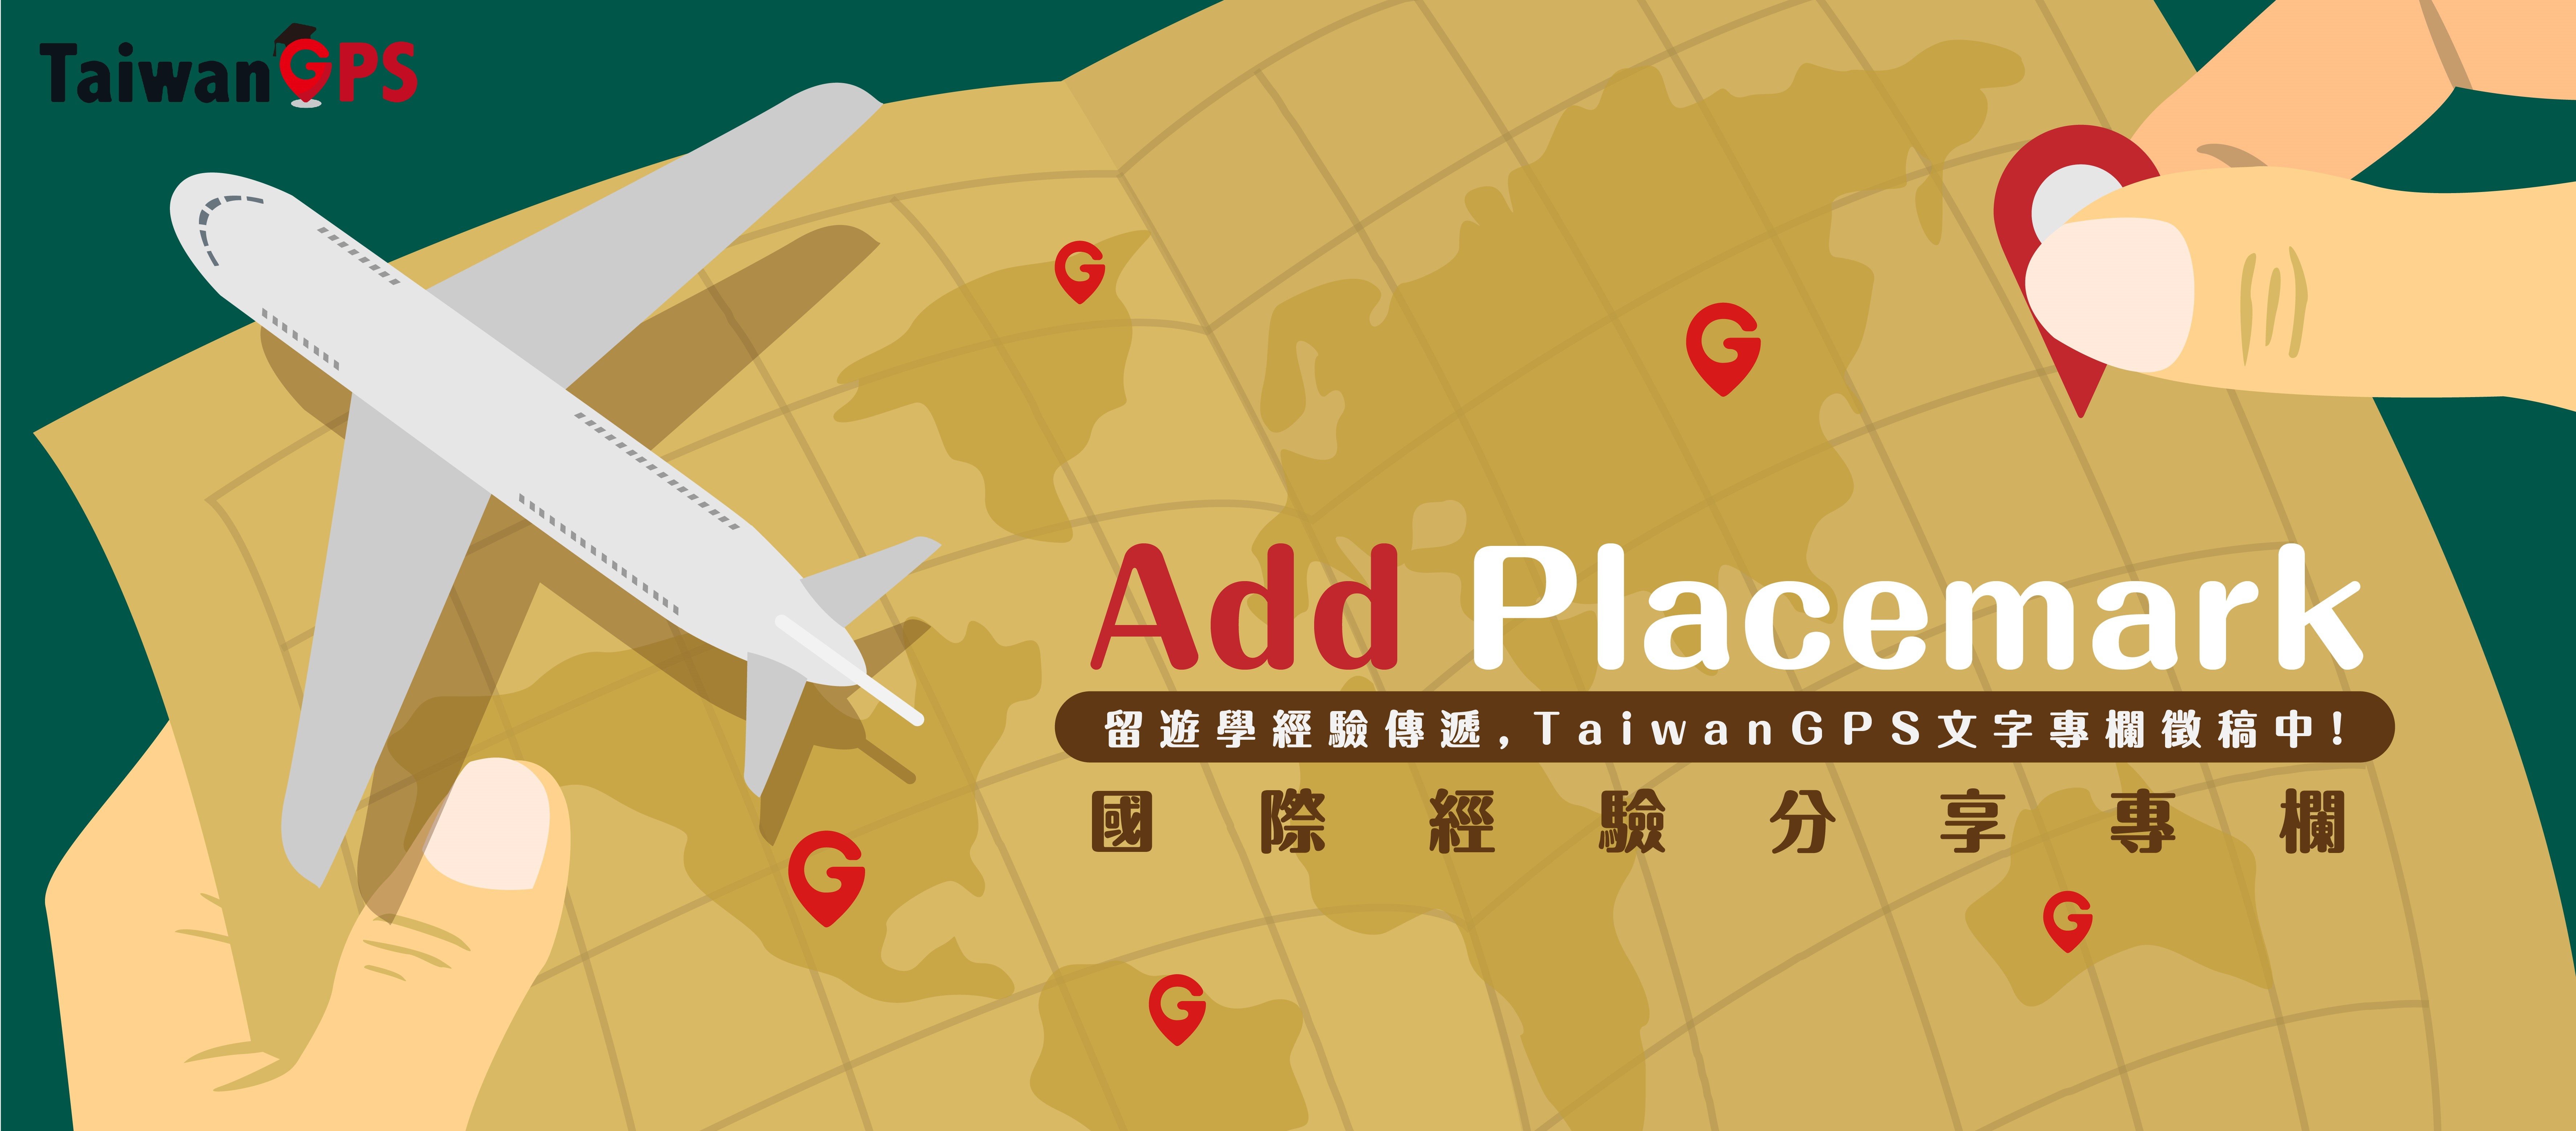 「Add Placemark : 國際經驗分享專欄」-文字專欄徵稿開跑!